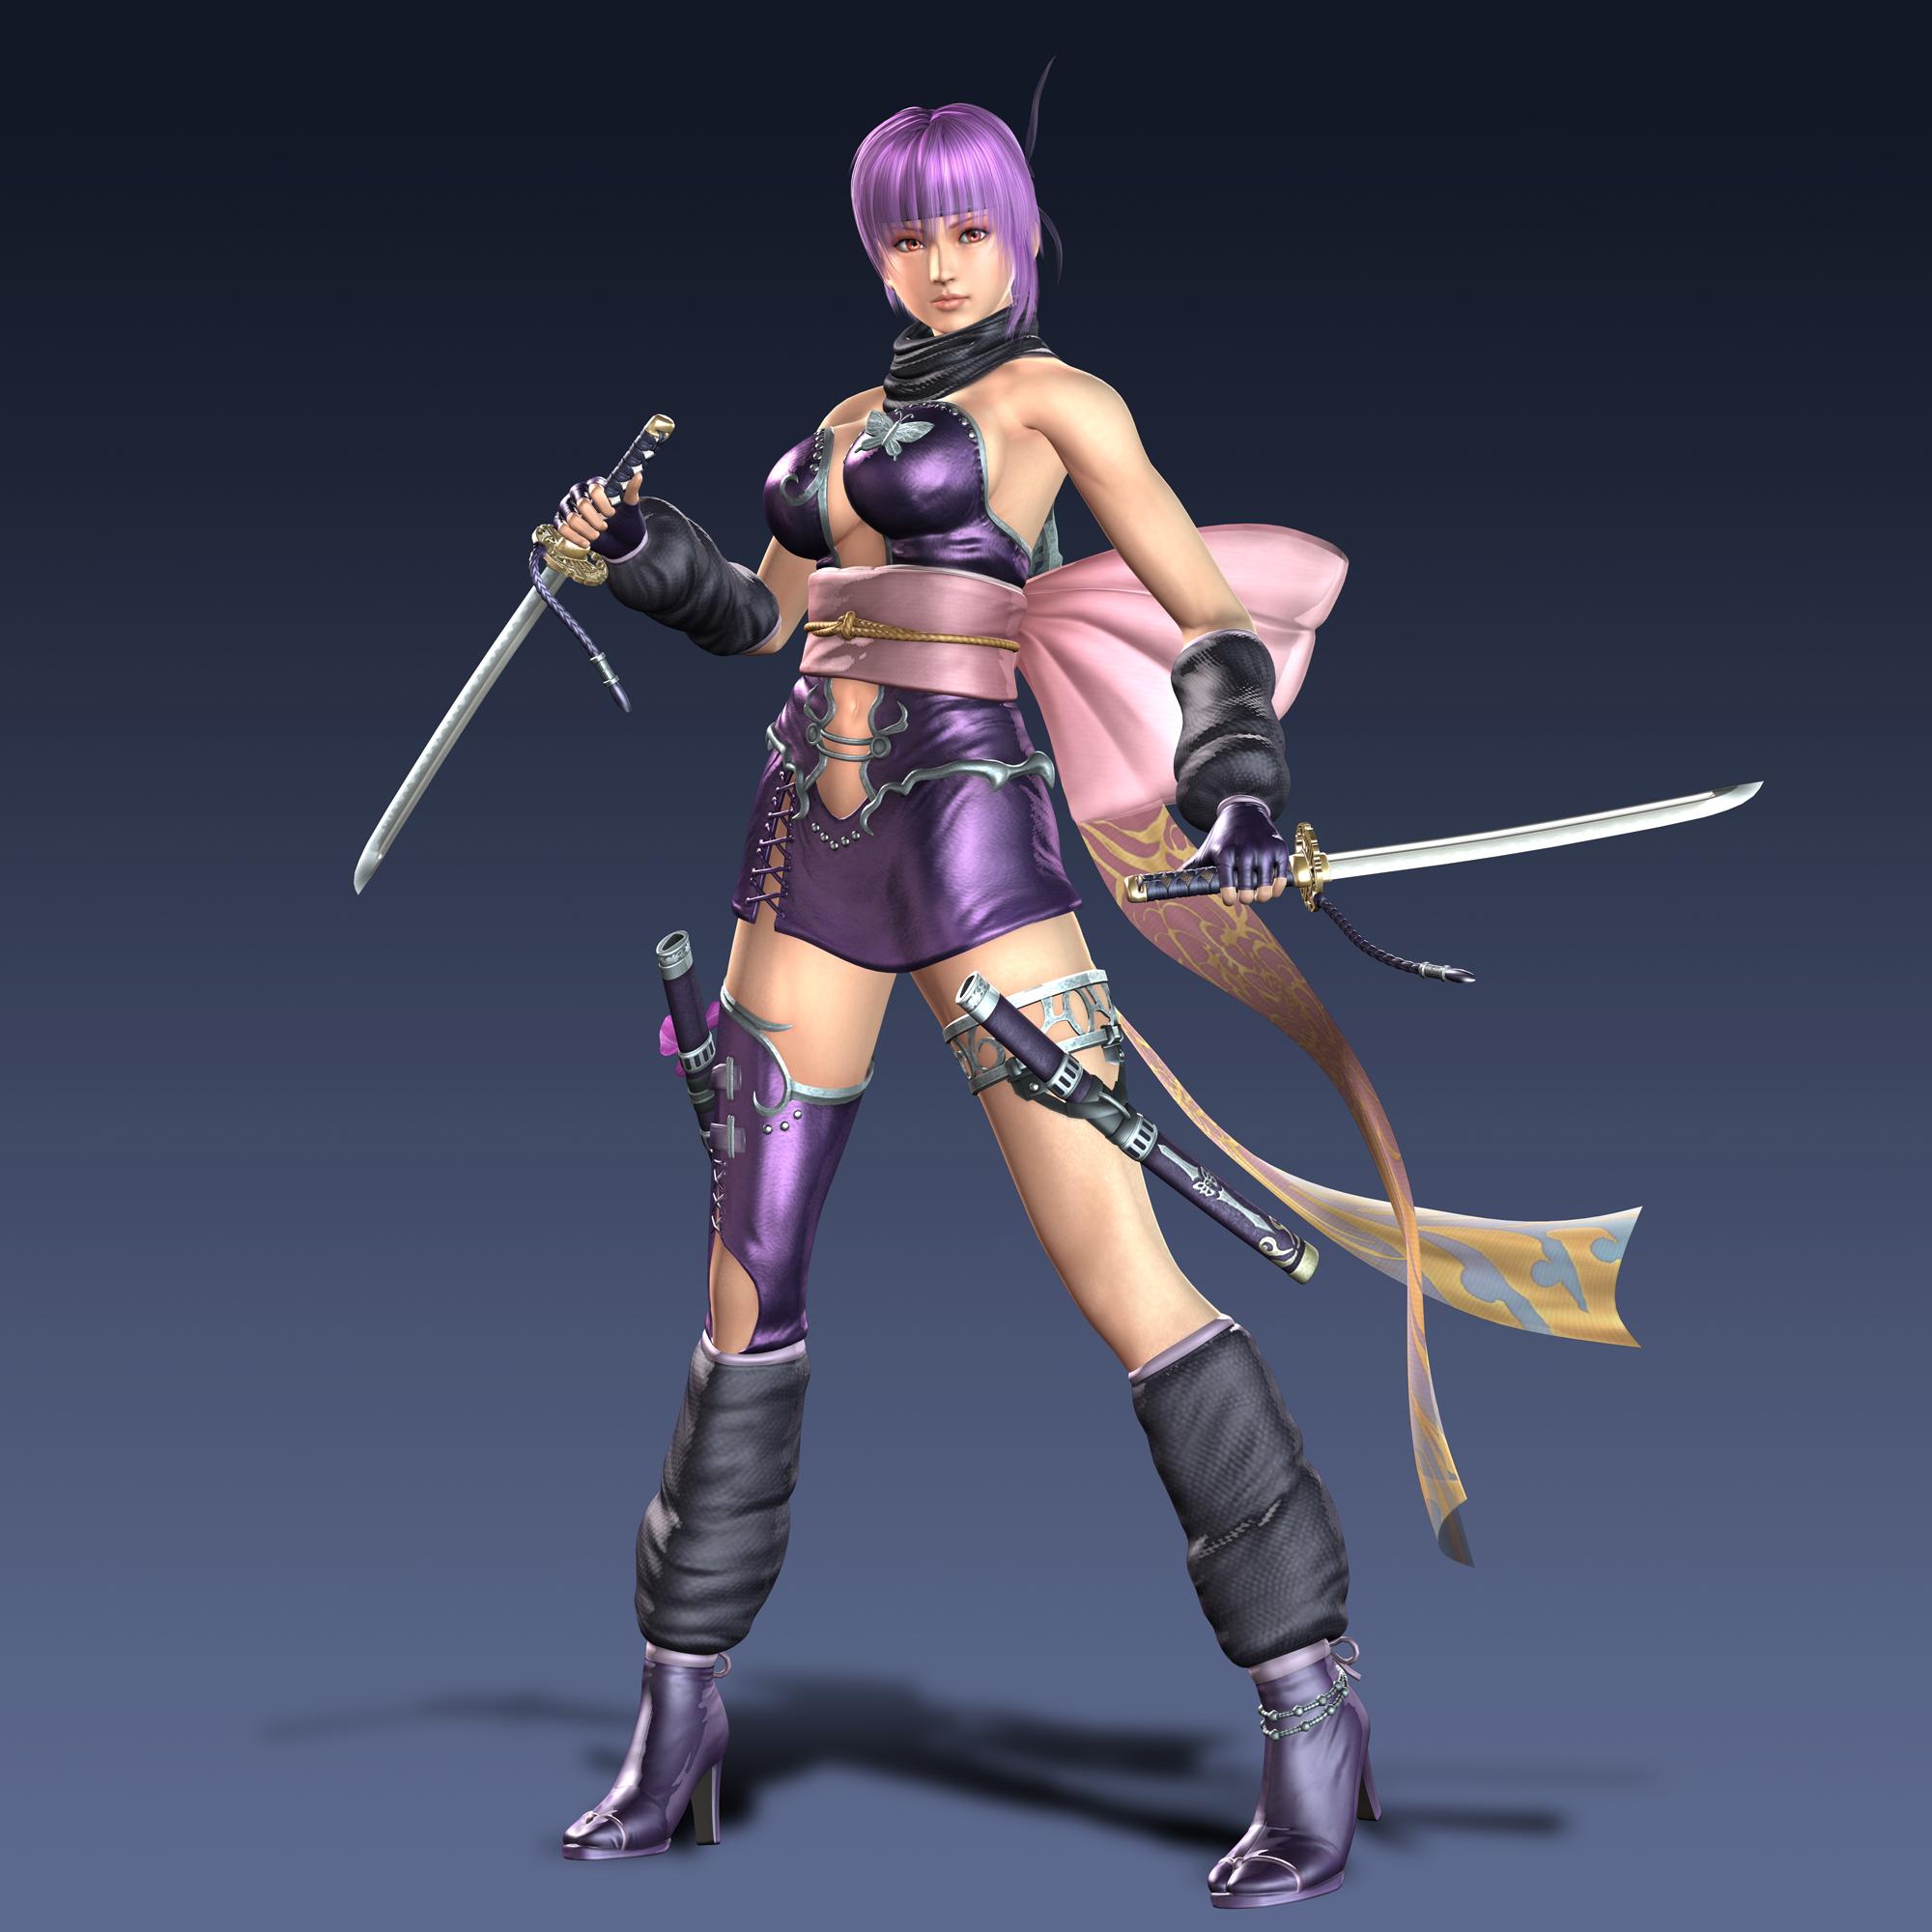 Warriors Orochi 3 Psp Nicoblog: Request Models For XNALara (v2)